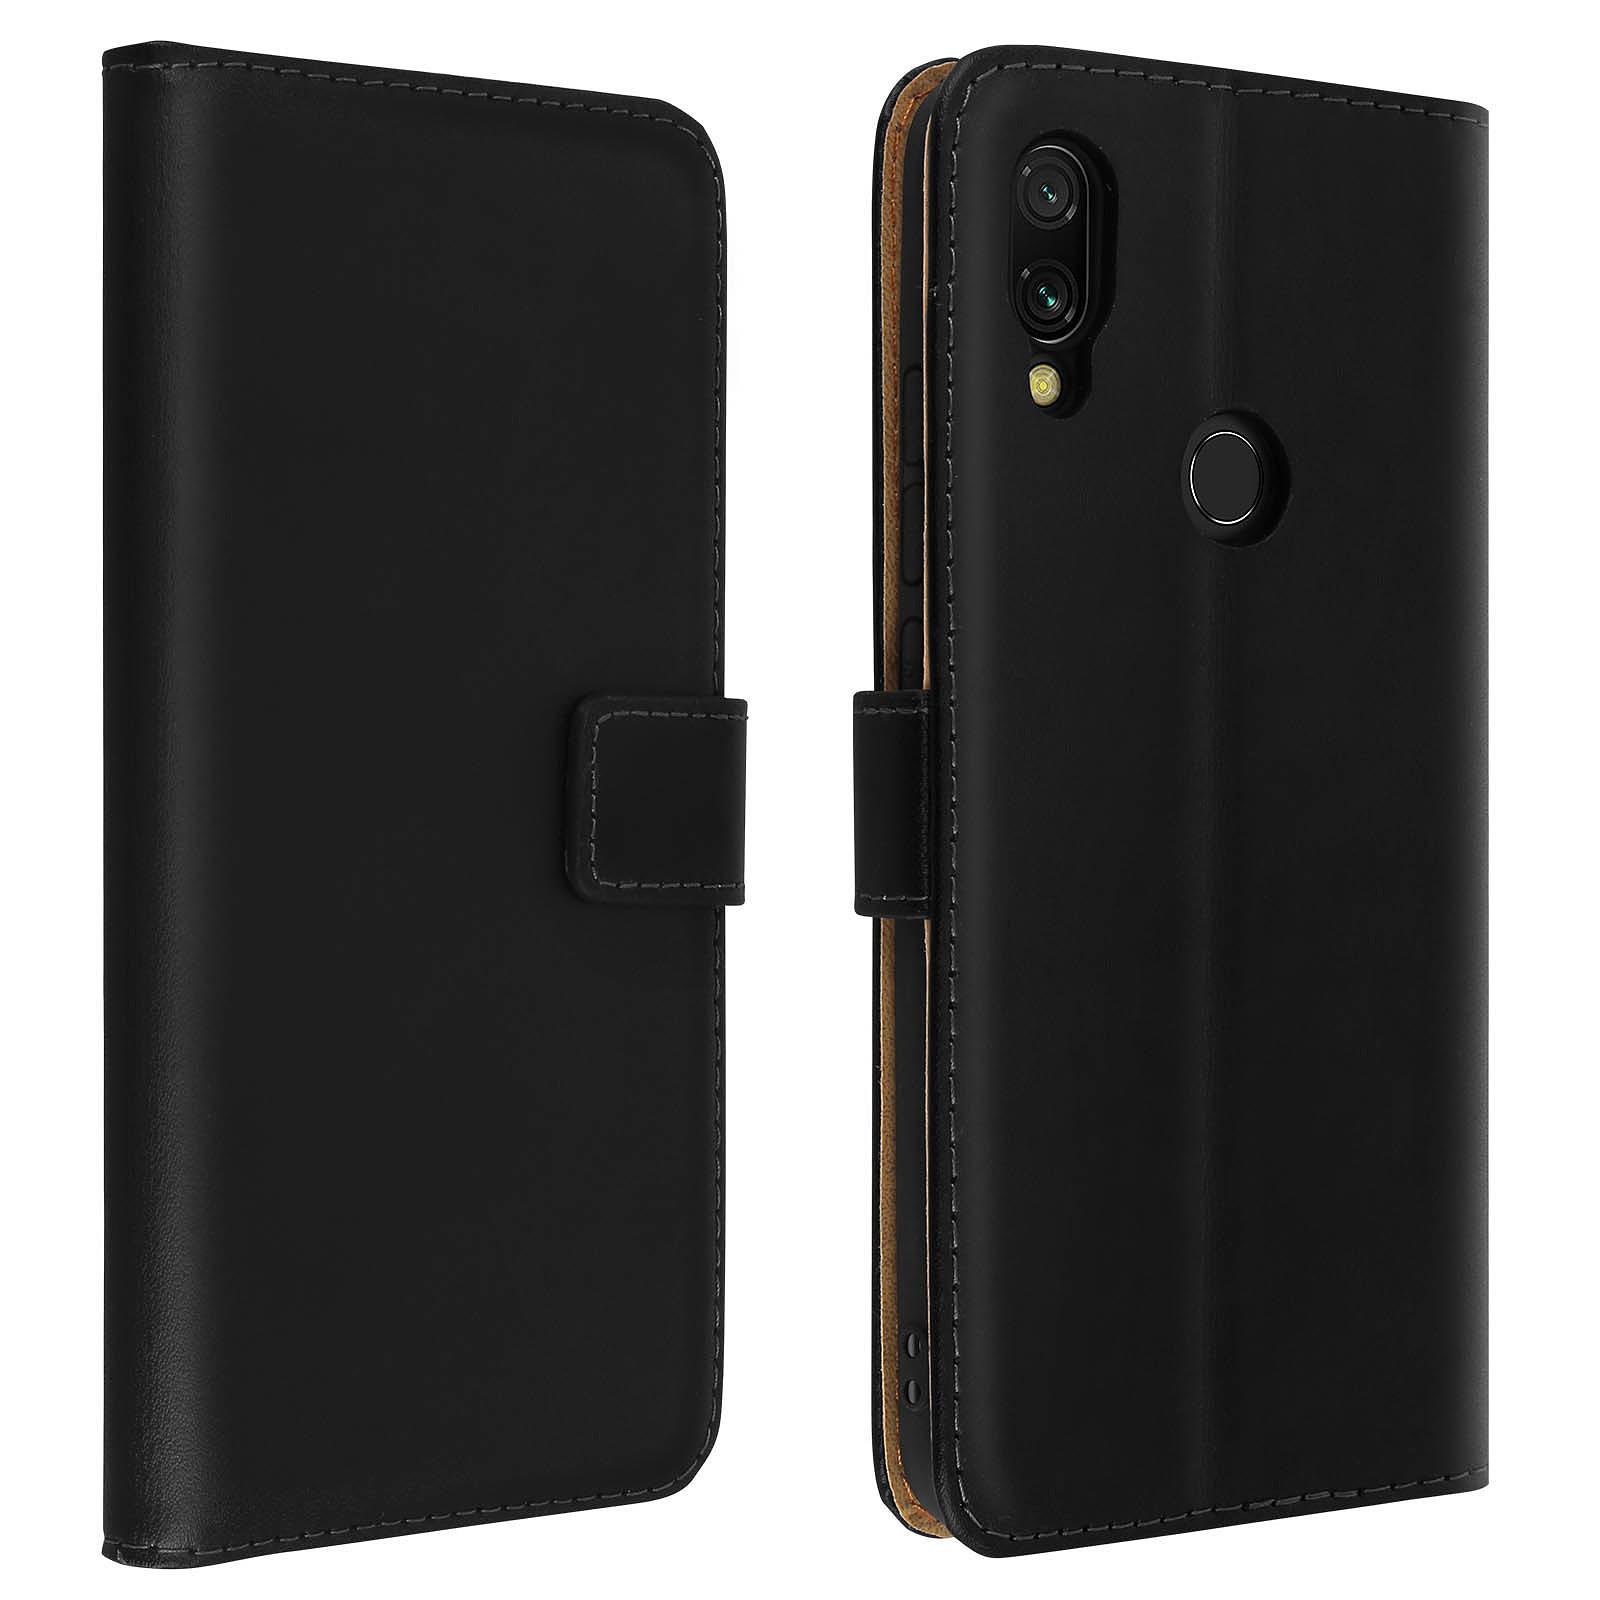 Avizar Etui folio Noir pour Xiaomi Redmi 7